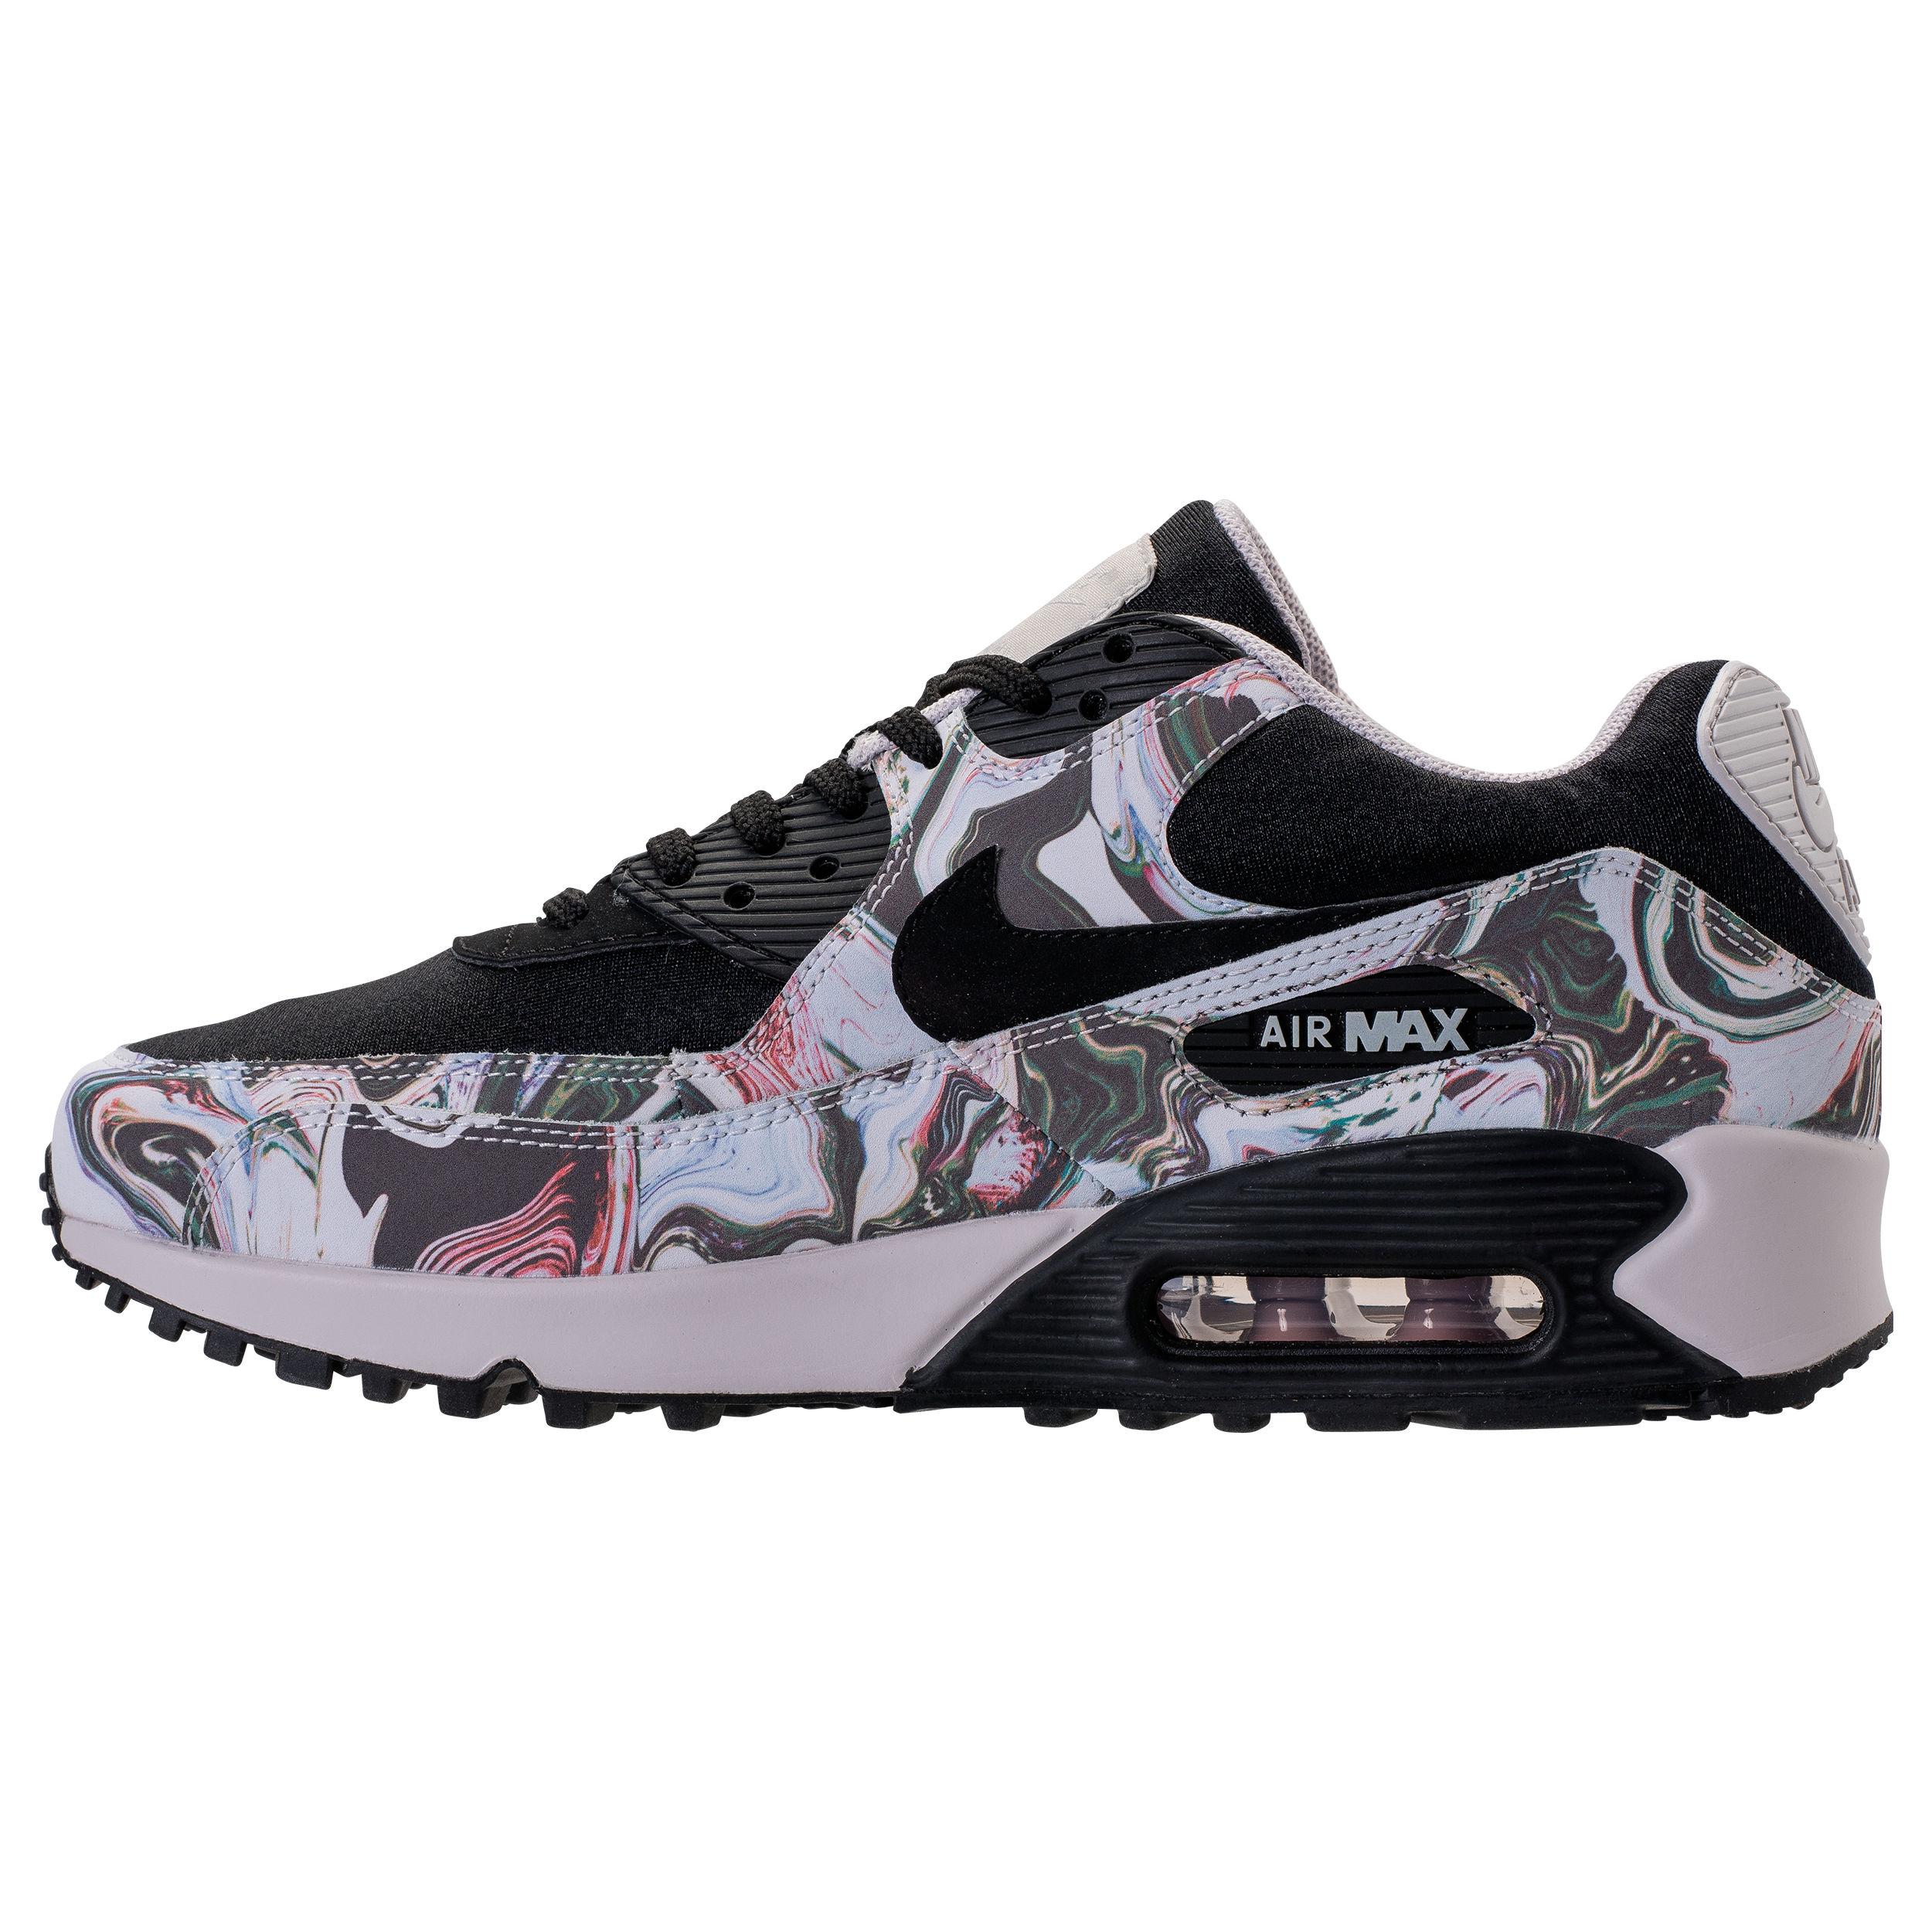 separation shoes 81b60 46732 nike air max 90 marble 4-20 3